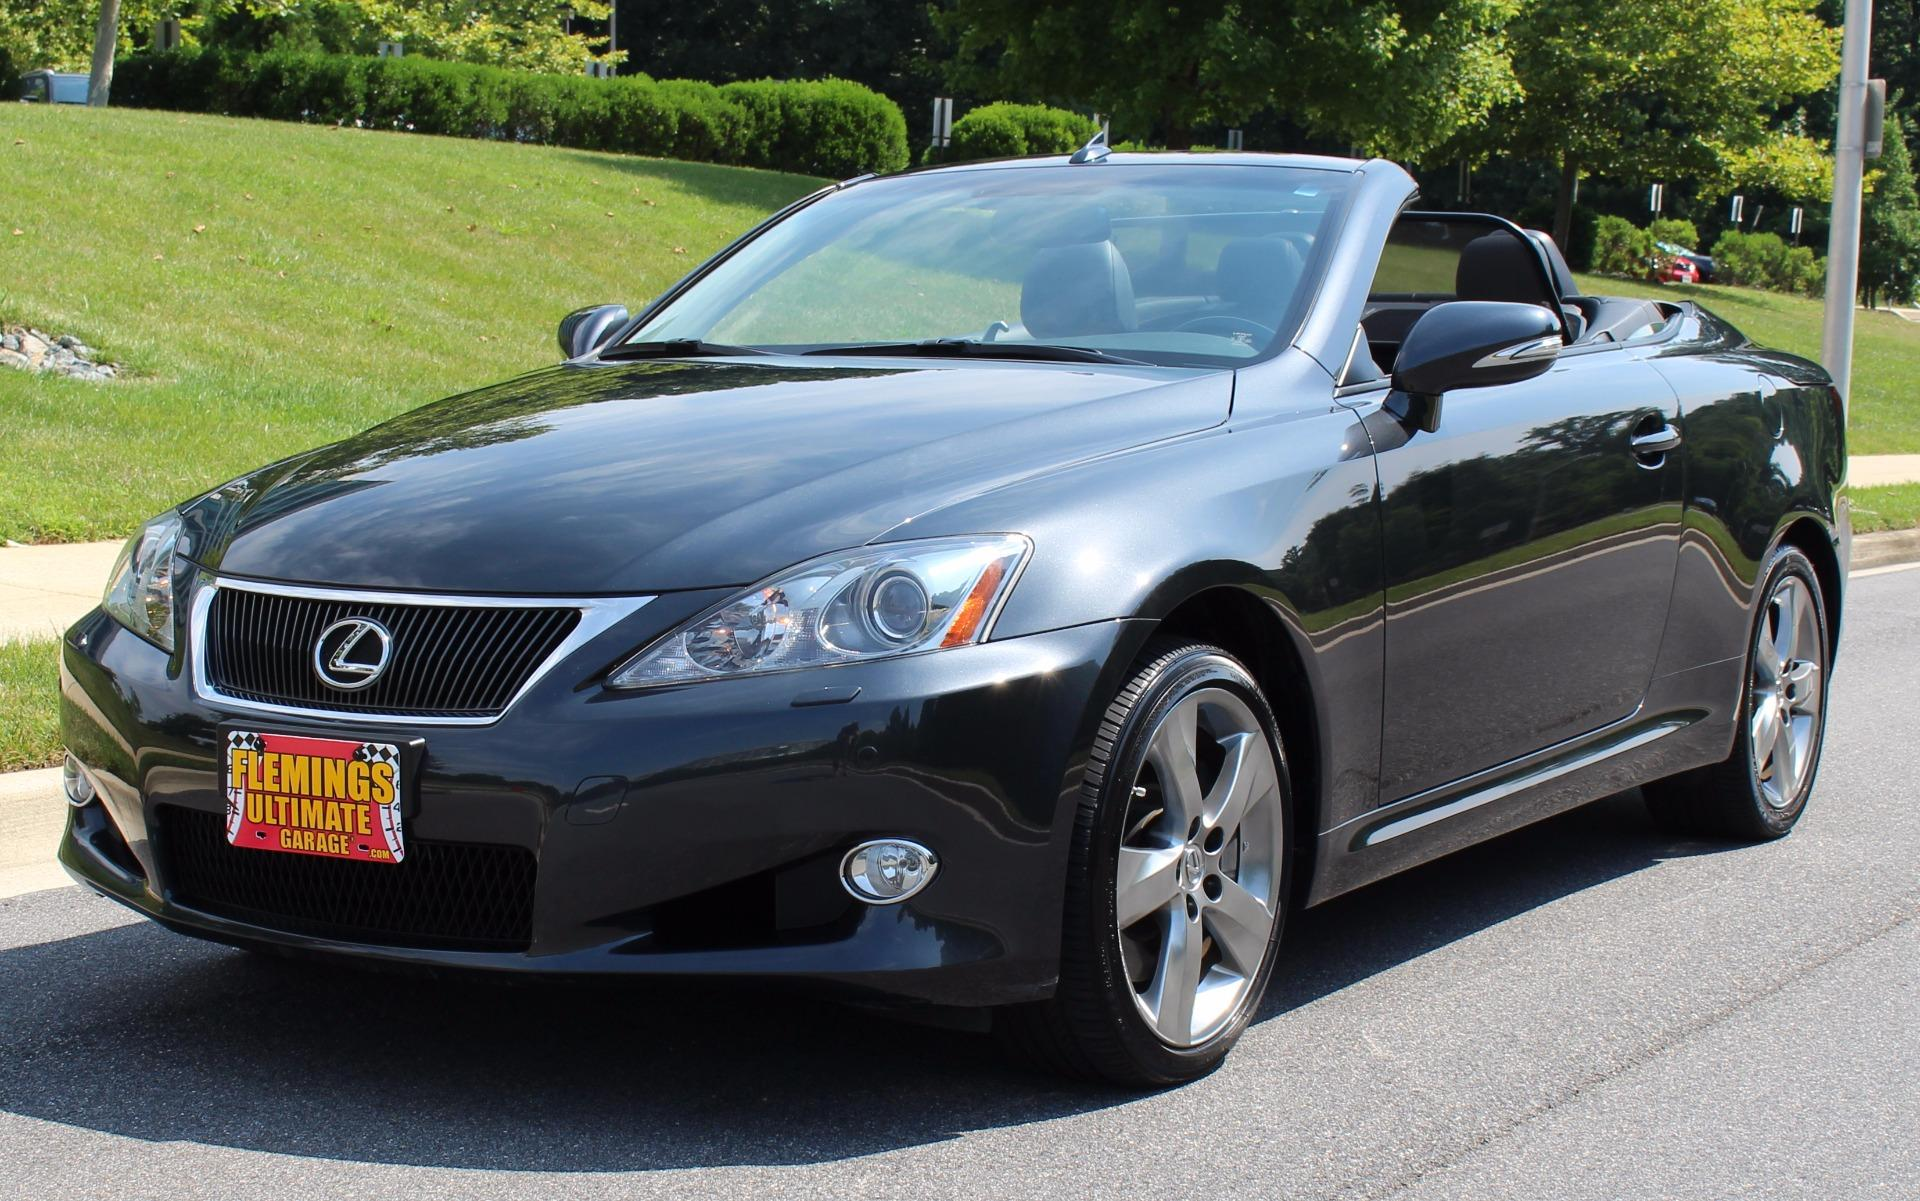 Used Lexus Is 350 >> 2010 Lexus IS 350 C